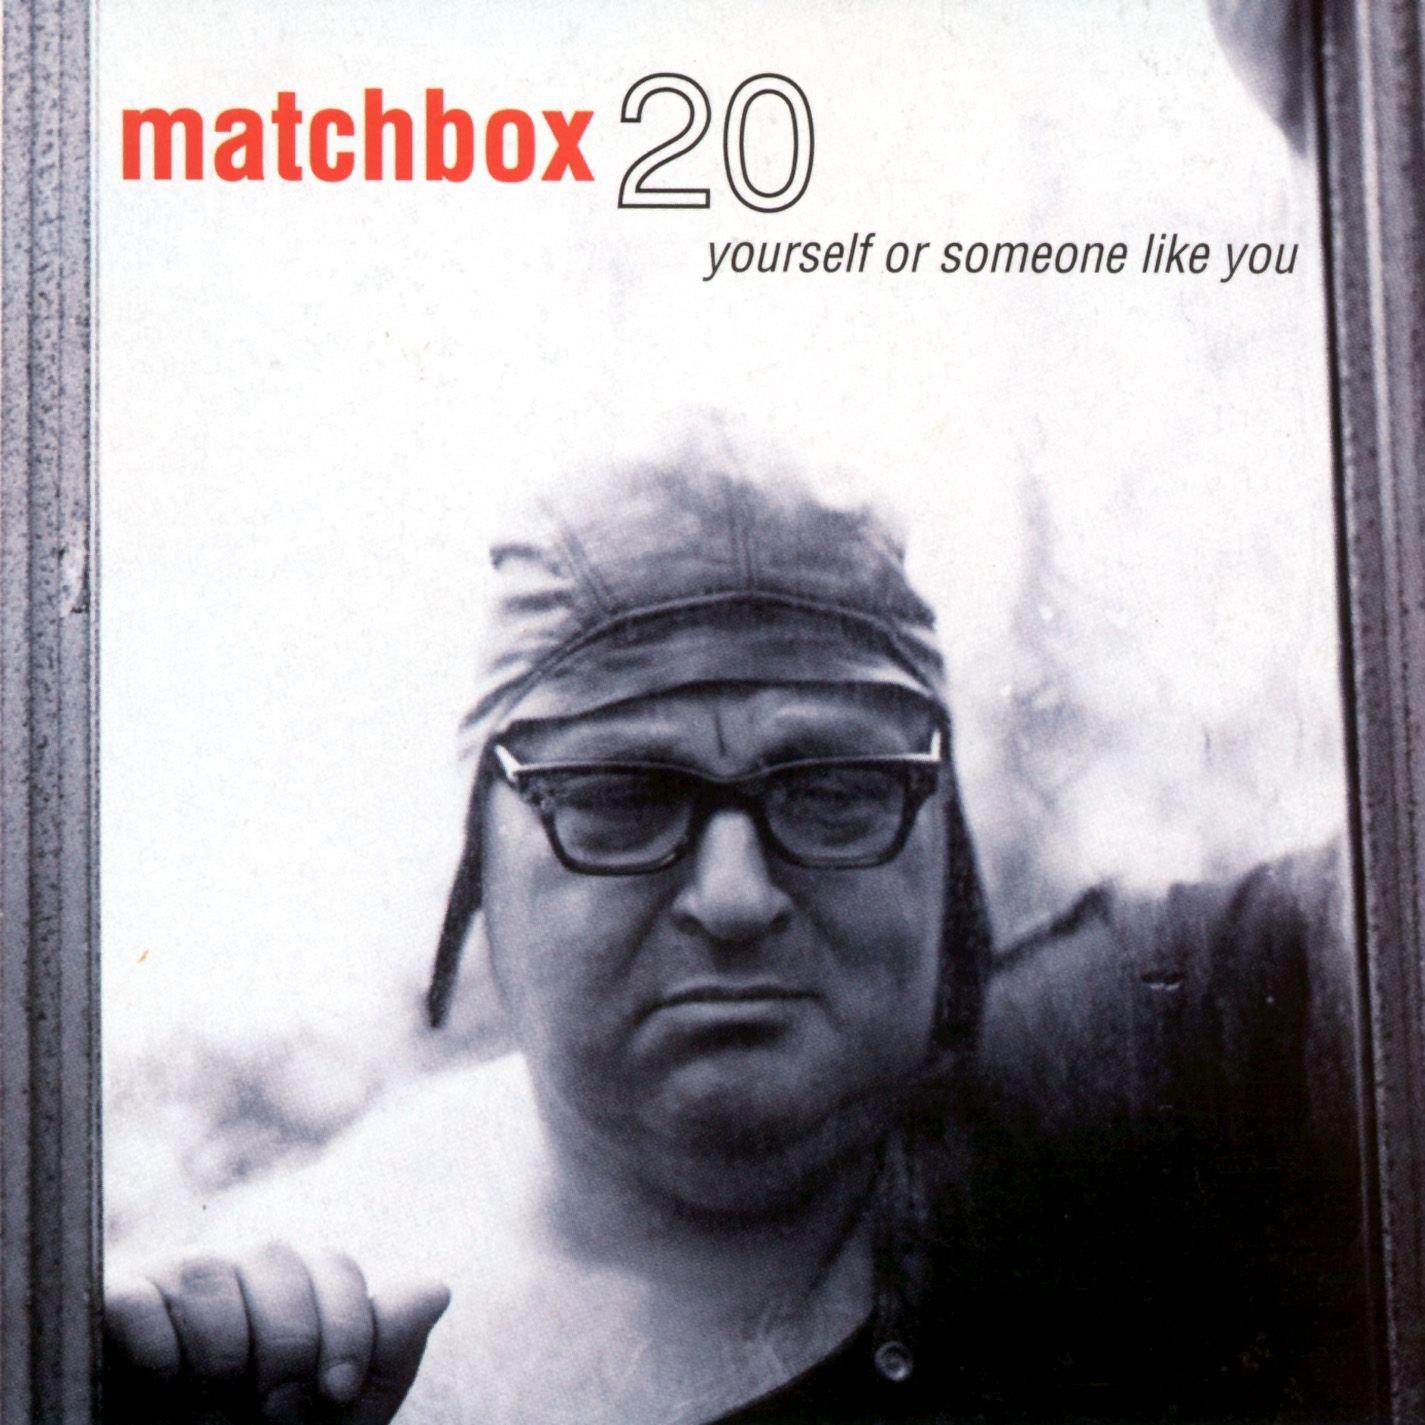 Matchbox Twenty - Yourself or Someone Like You - Amazon.com Music